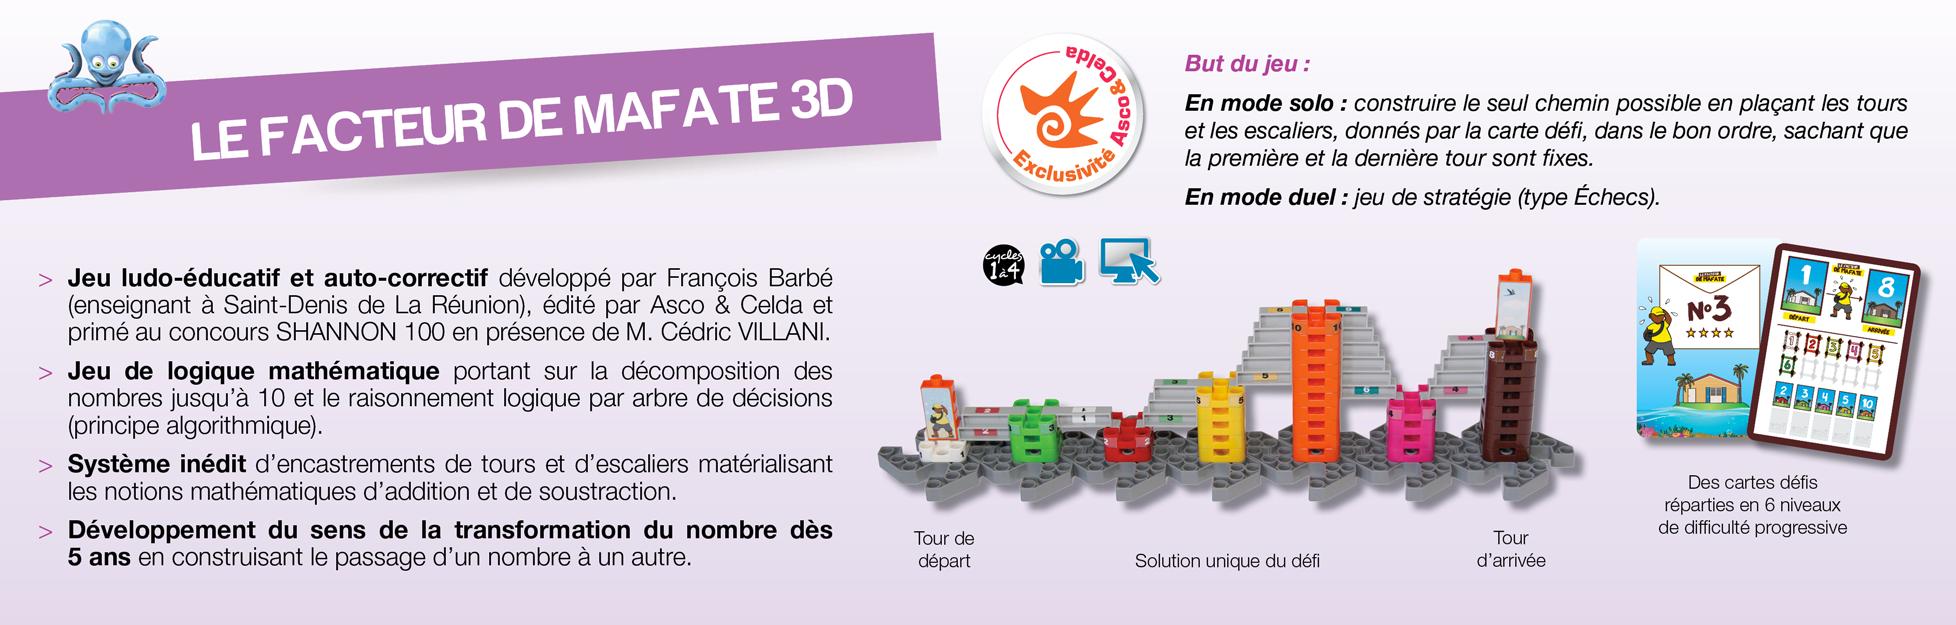 Le Facteur de Mafate 3D